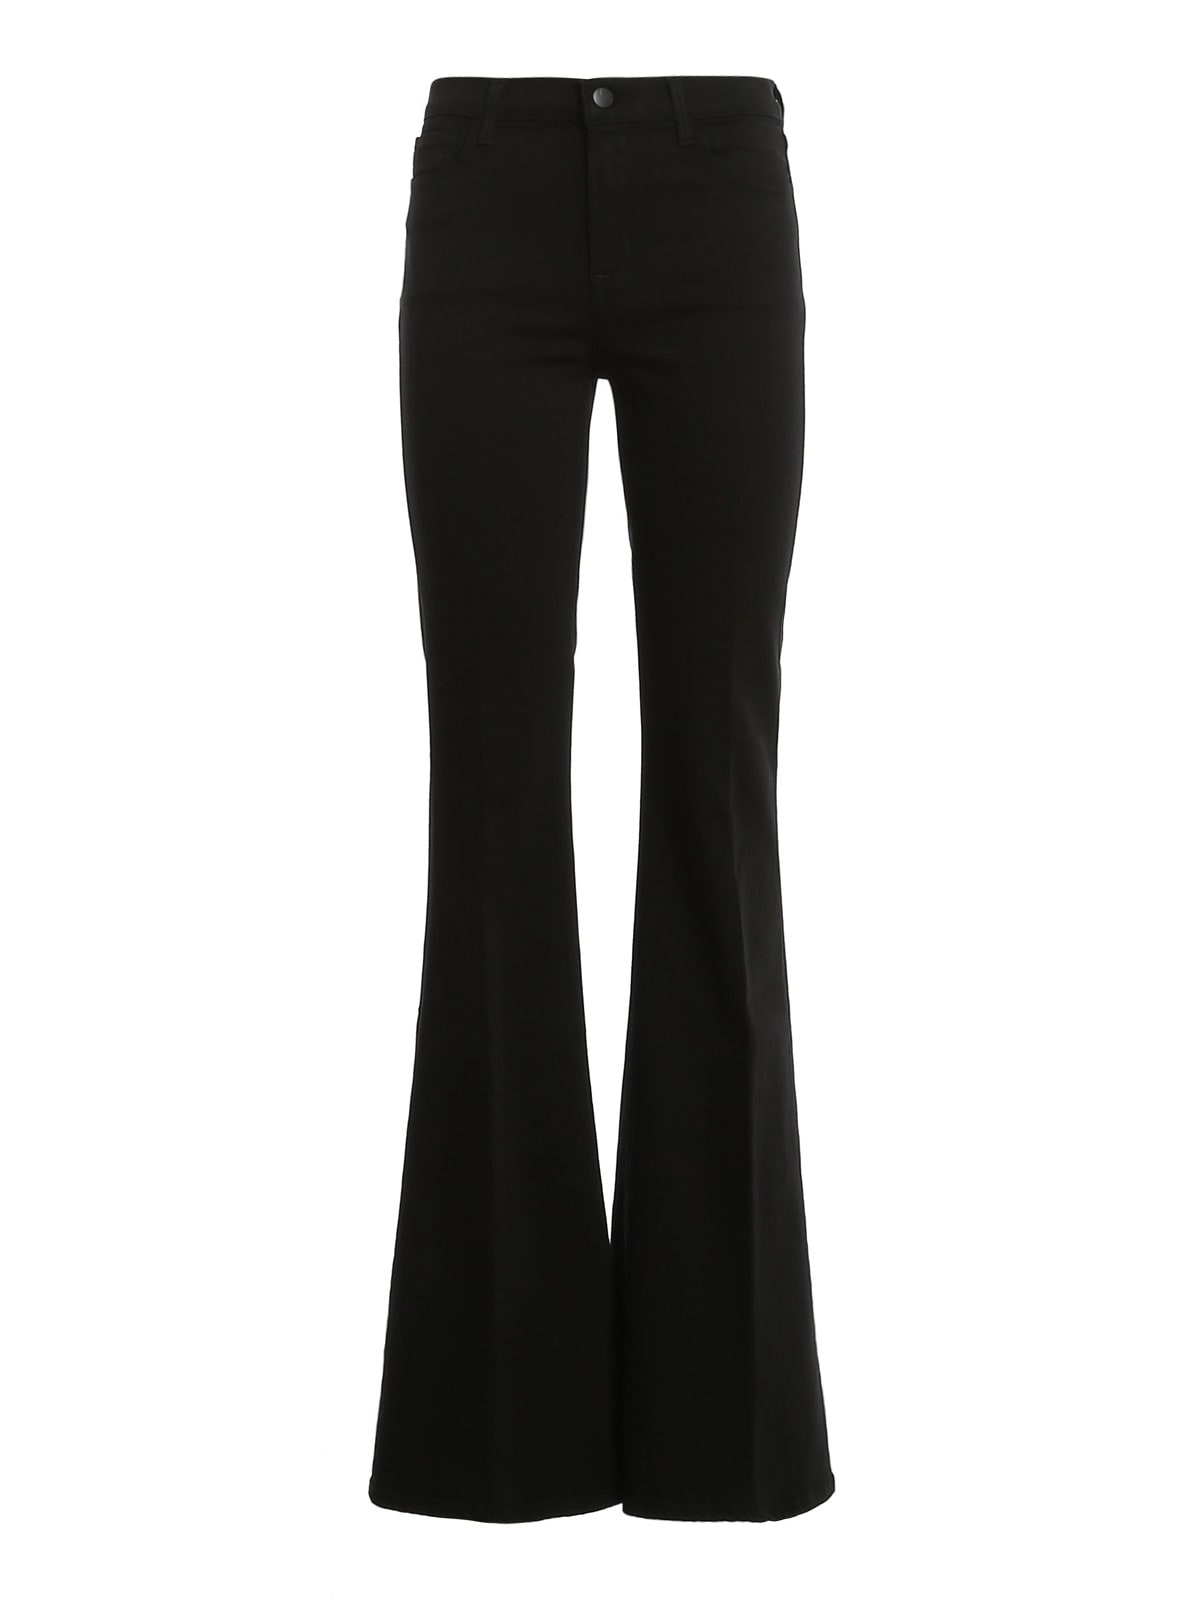 J Brand Valentina Flare Jeans